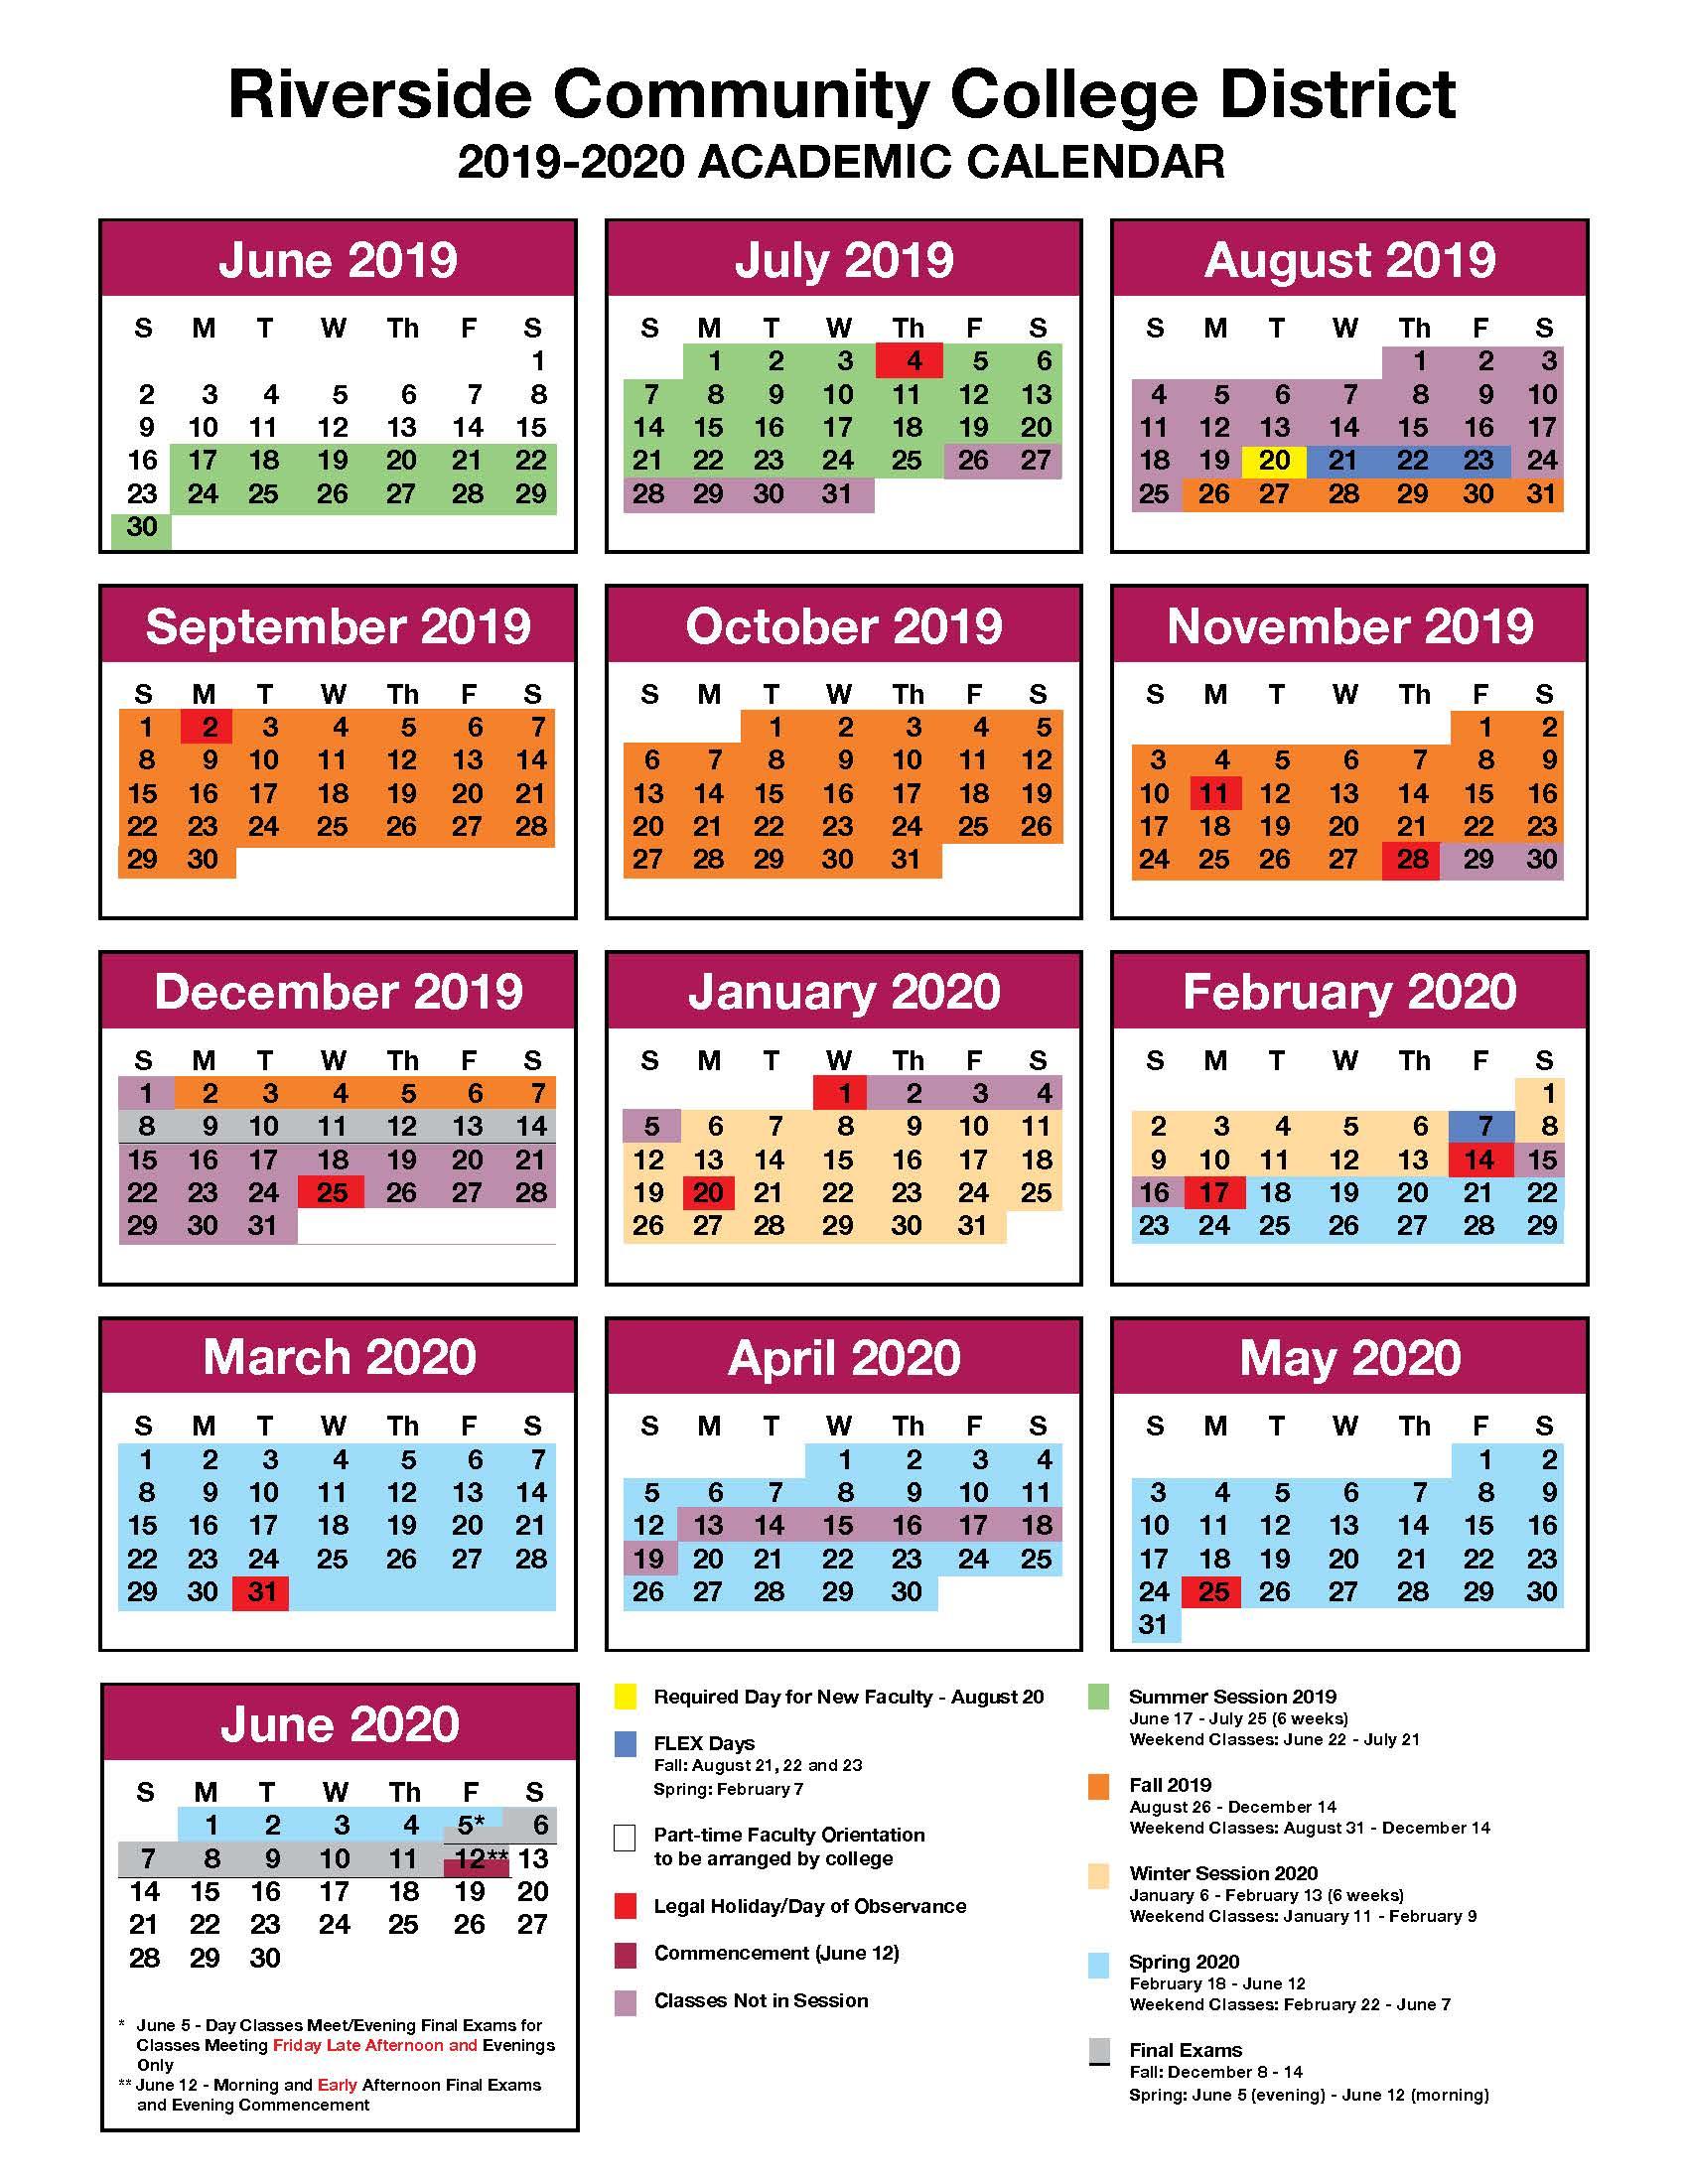 Jfk And Norco College Calendar 2019 2020 – John F. Kennedy Within Diamond Bar High School Calendar 2021 2020